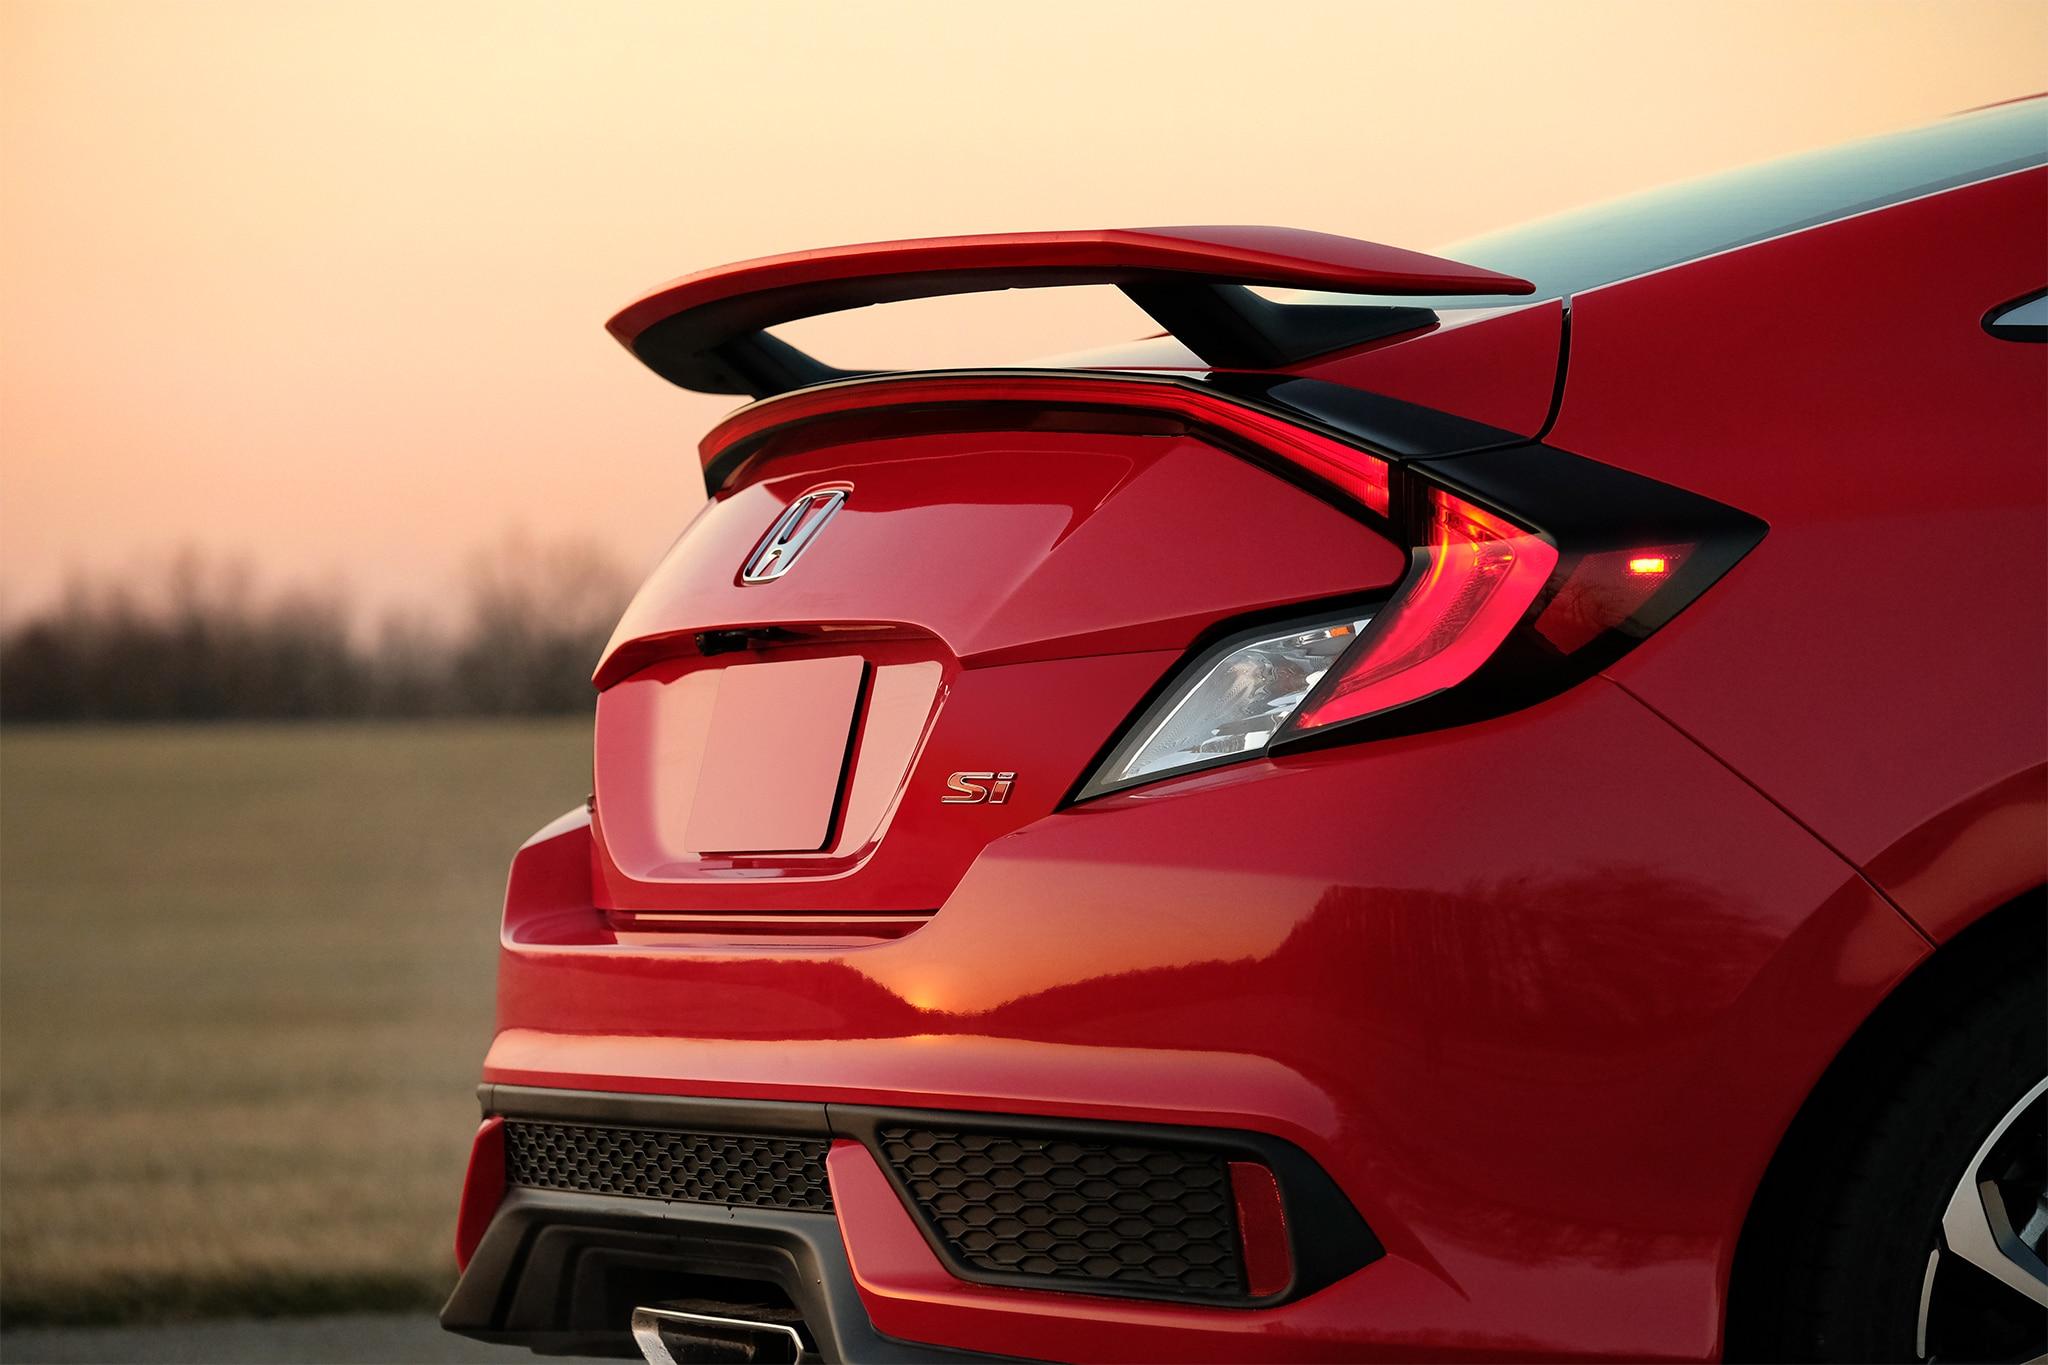 2017 Honda Civic Si Coupe Quick Take Review